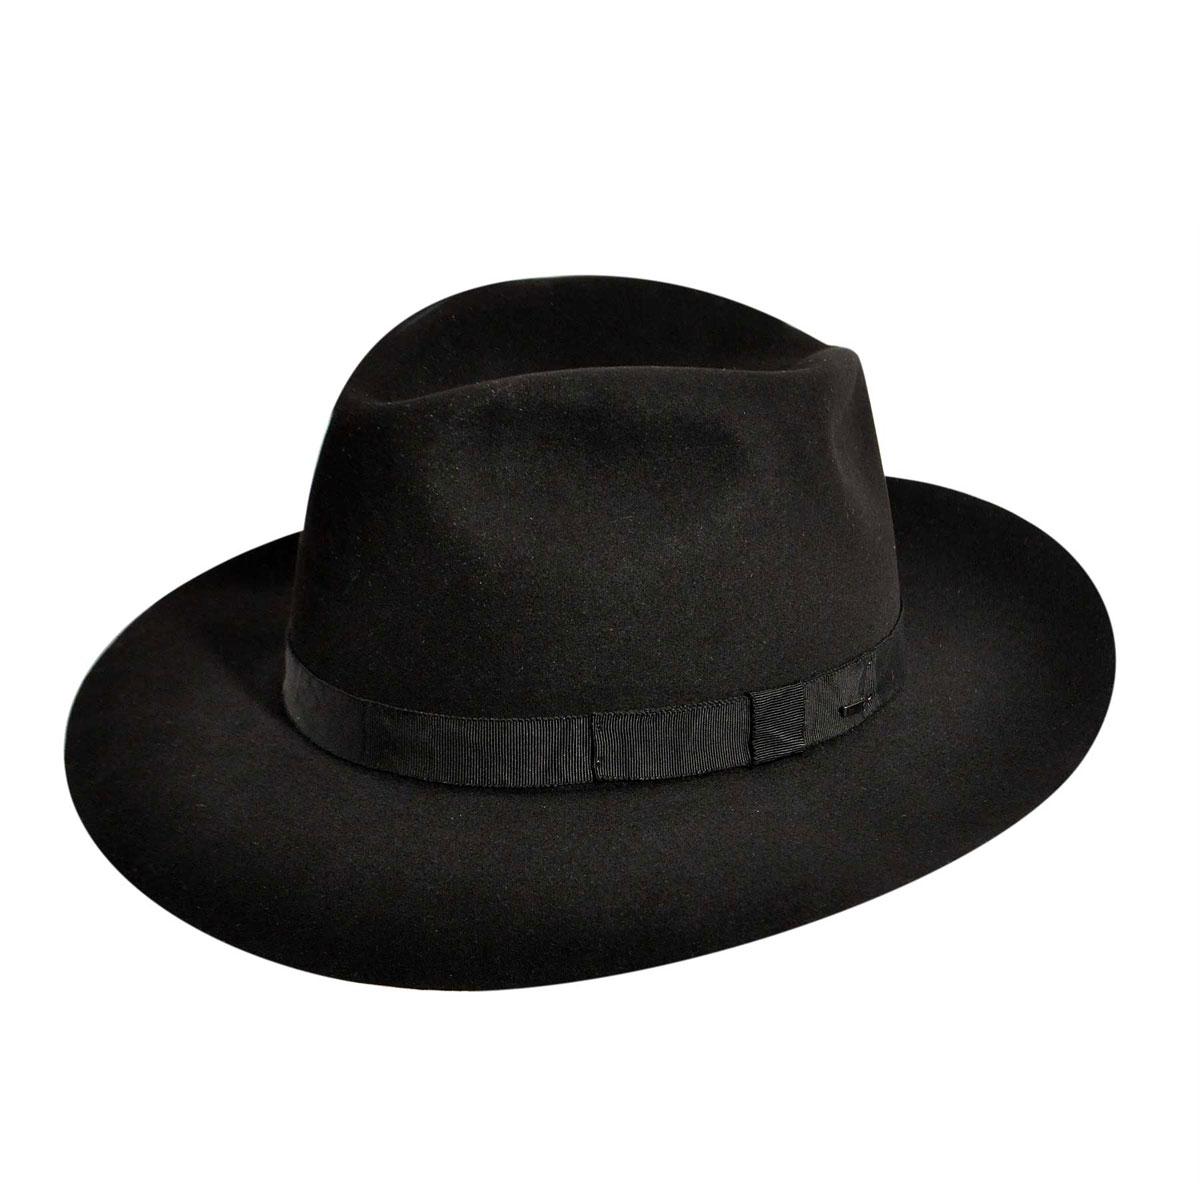 New Edwardian Style Men's Hats 1900-1920 Noble Fedora $350.00 AT vintagedancer.com